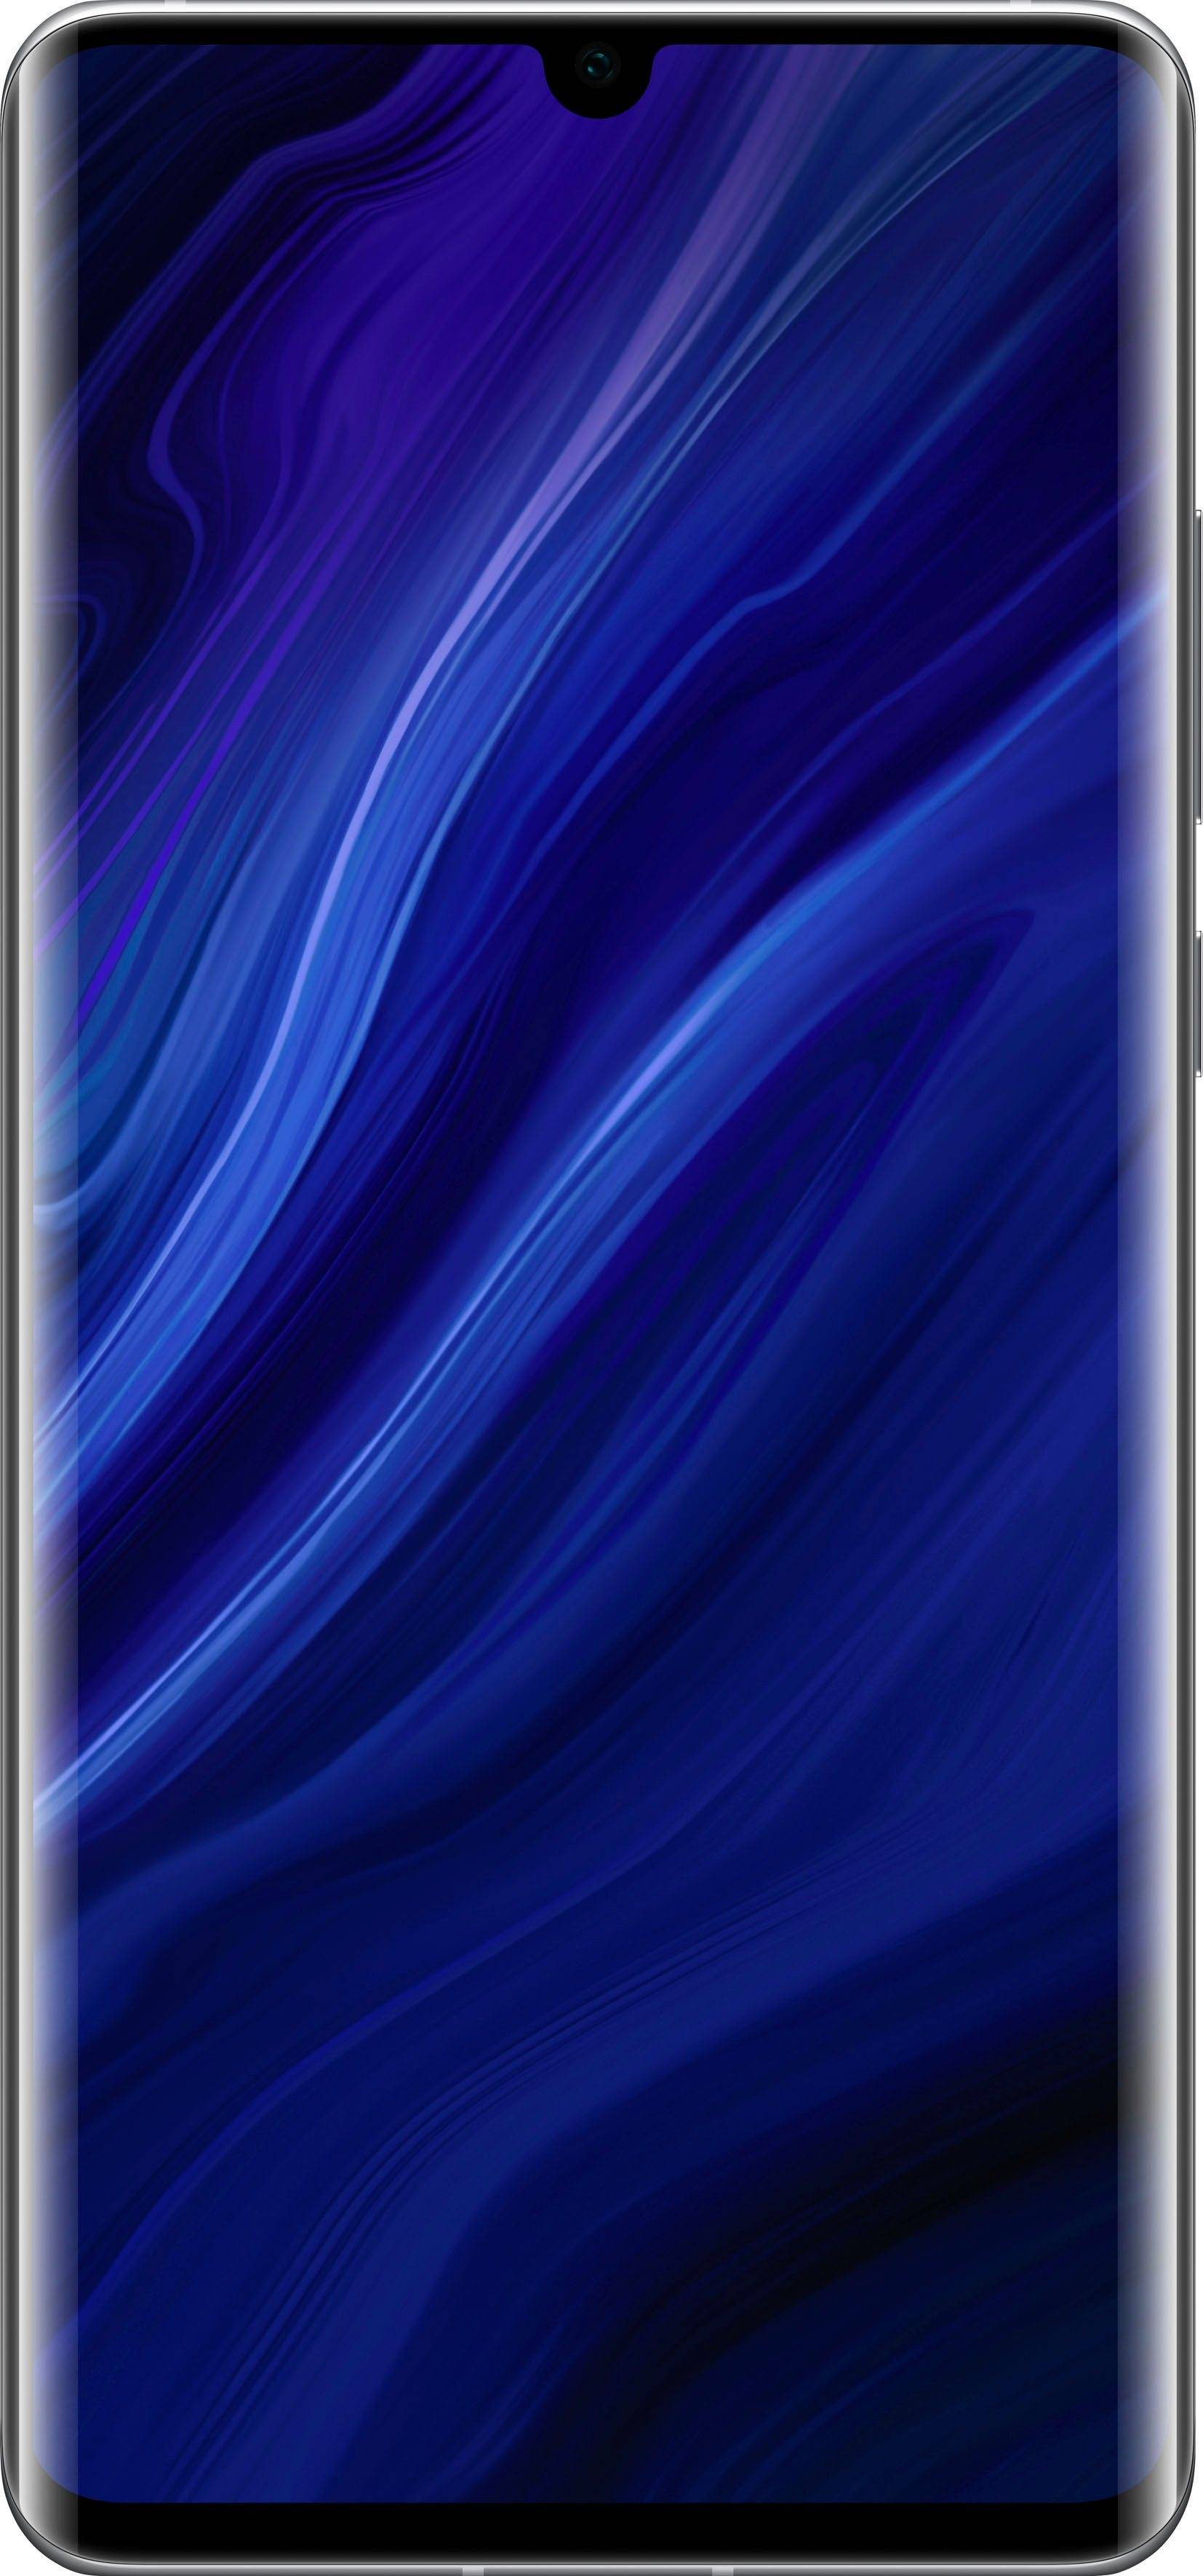 Huawei P30 Pro NEW EDITION Smartphone (16,43 cm/6,47 Zoll, 256 GB Speicherplatz, 40 MP Kamera), Silver Frost